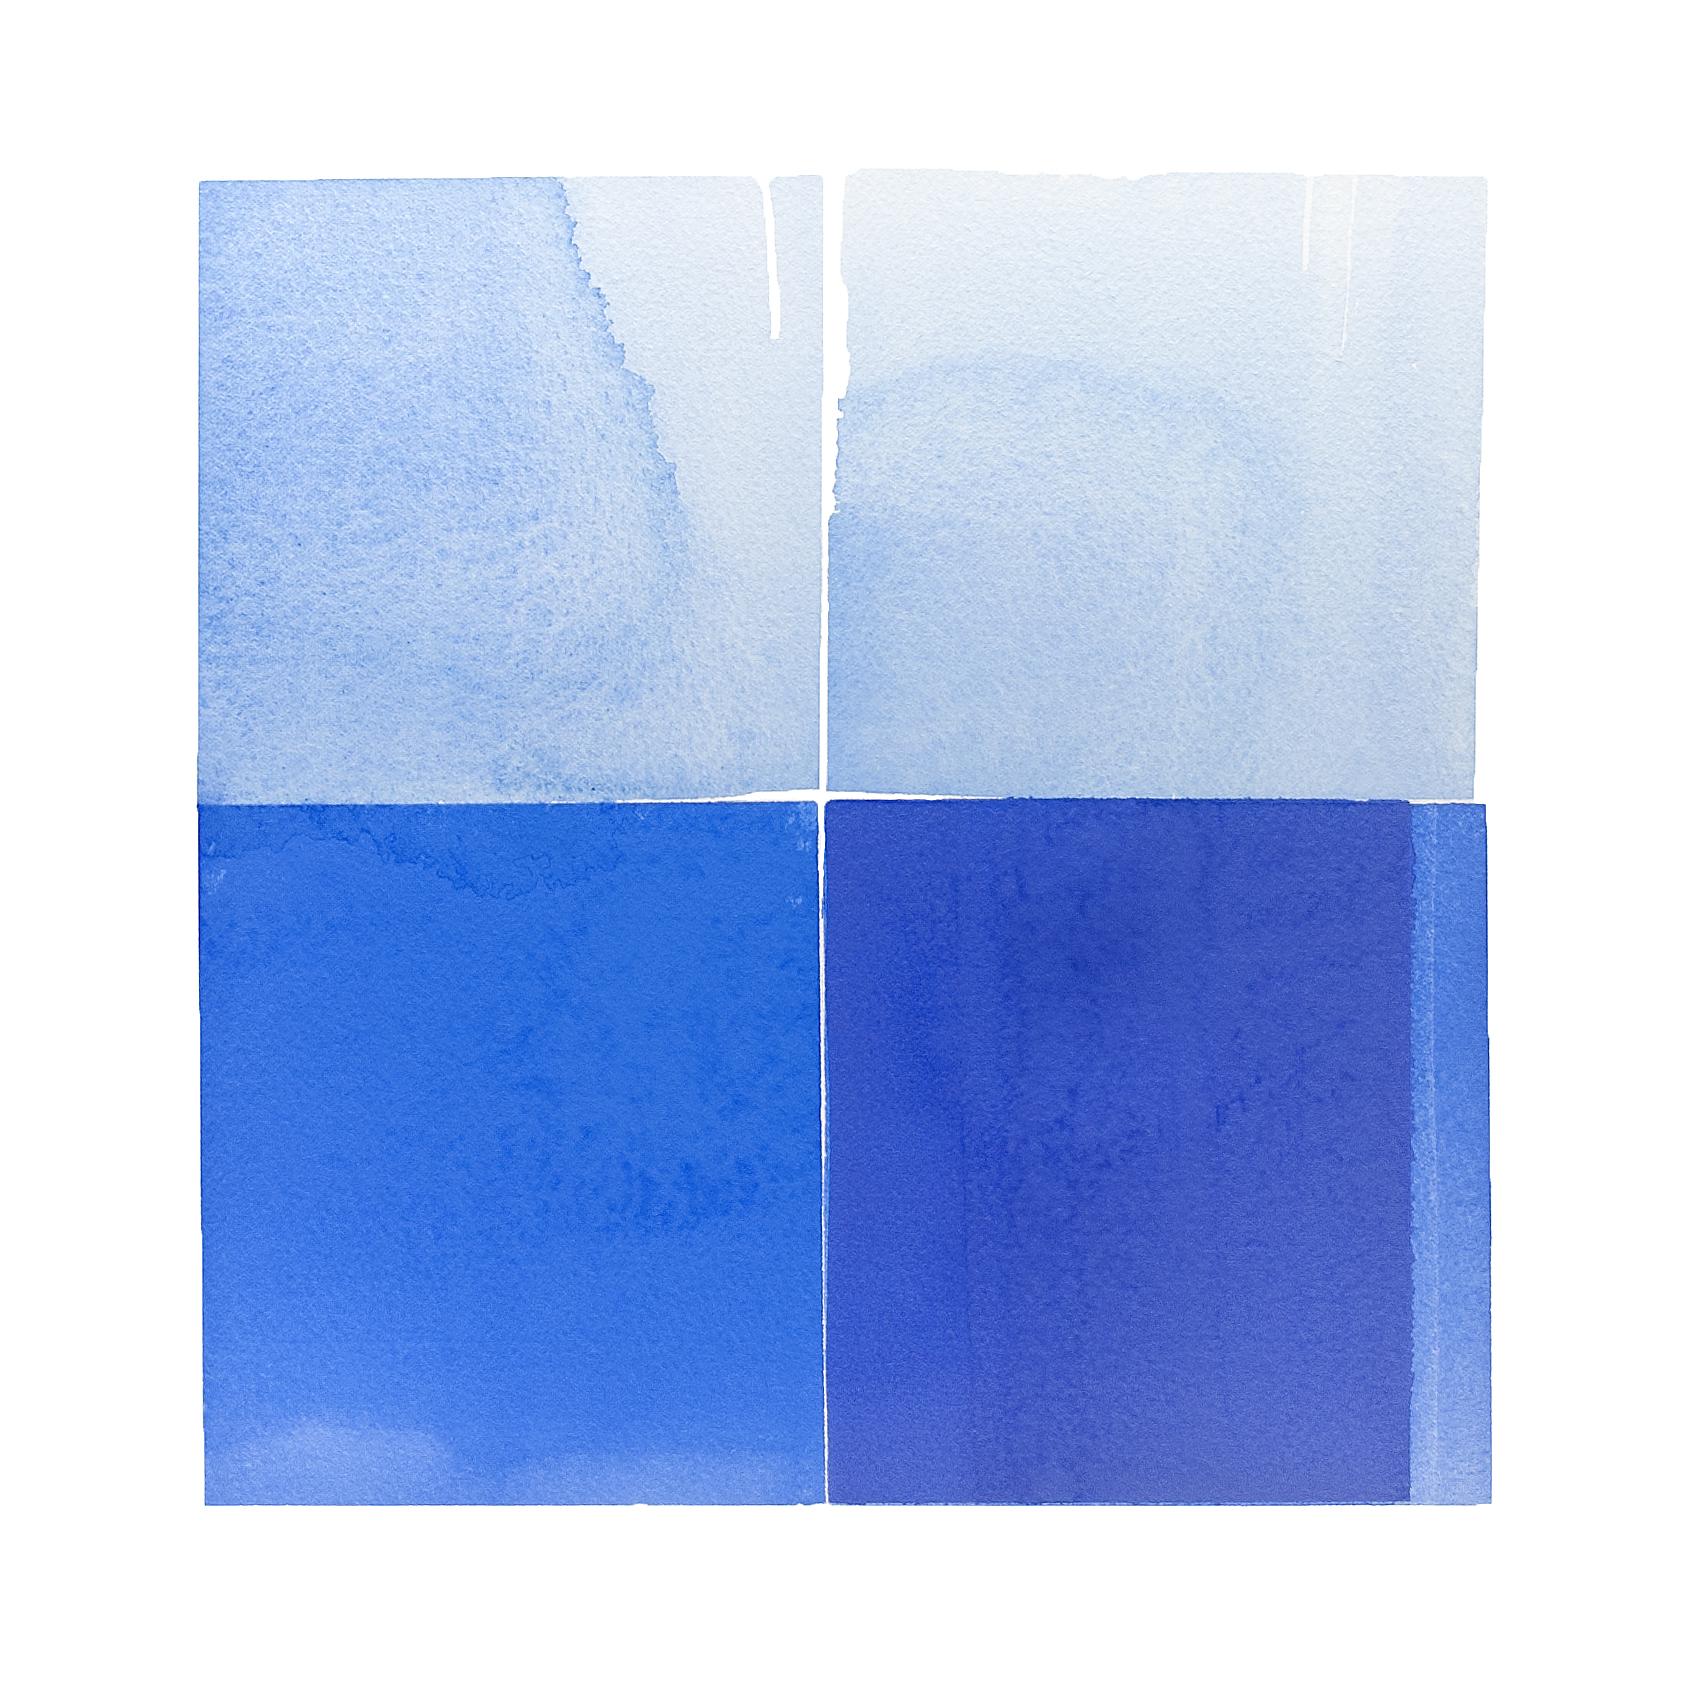 "Leviathan VIII---w/c on Fabriano Artistico---10.75"" x 10.25"""